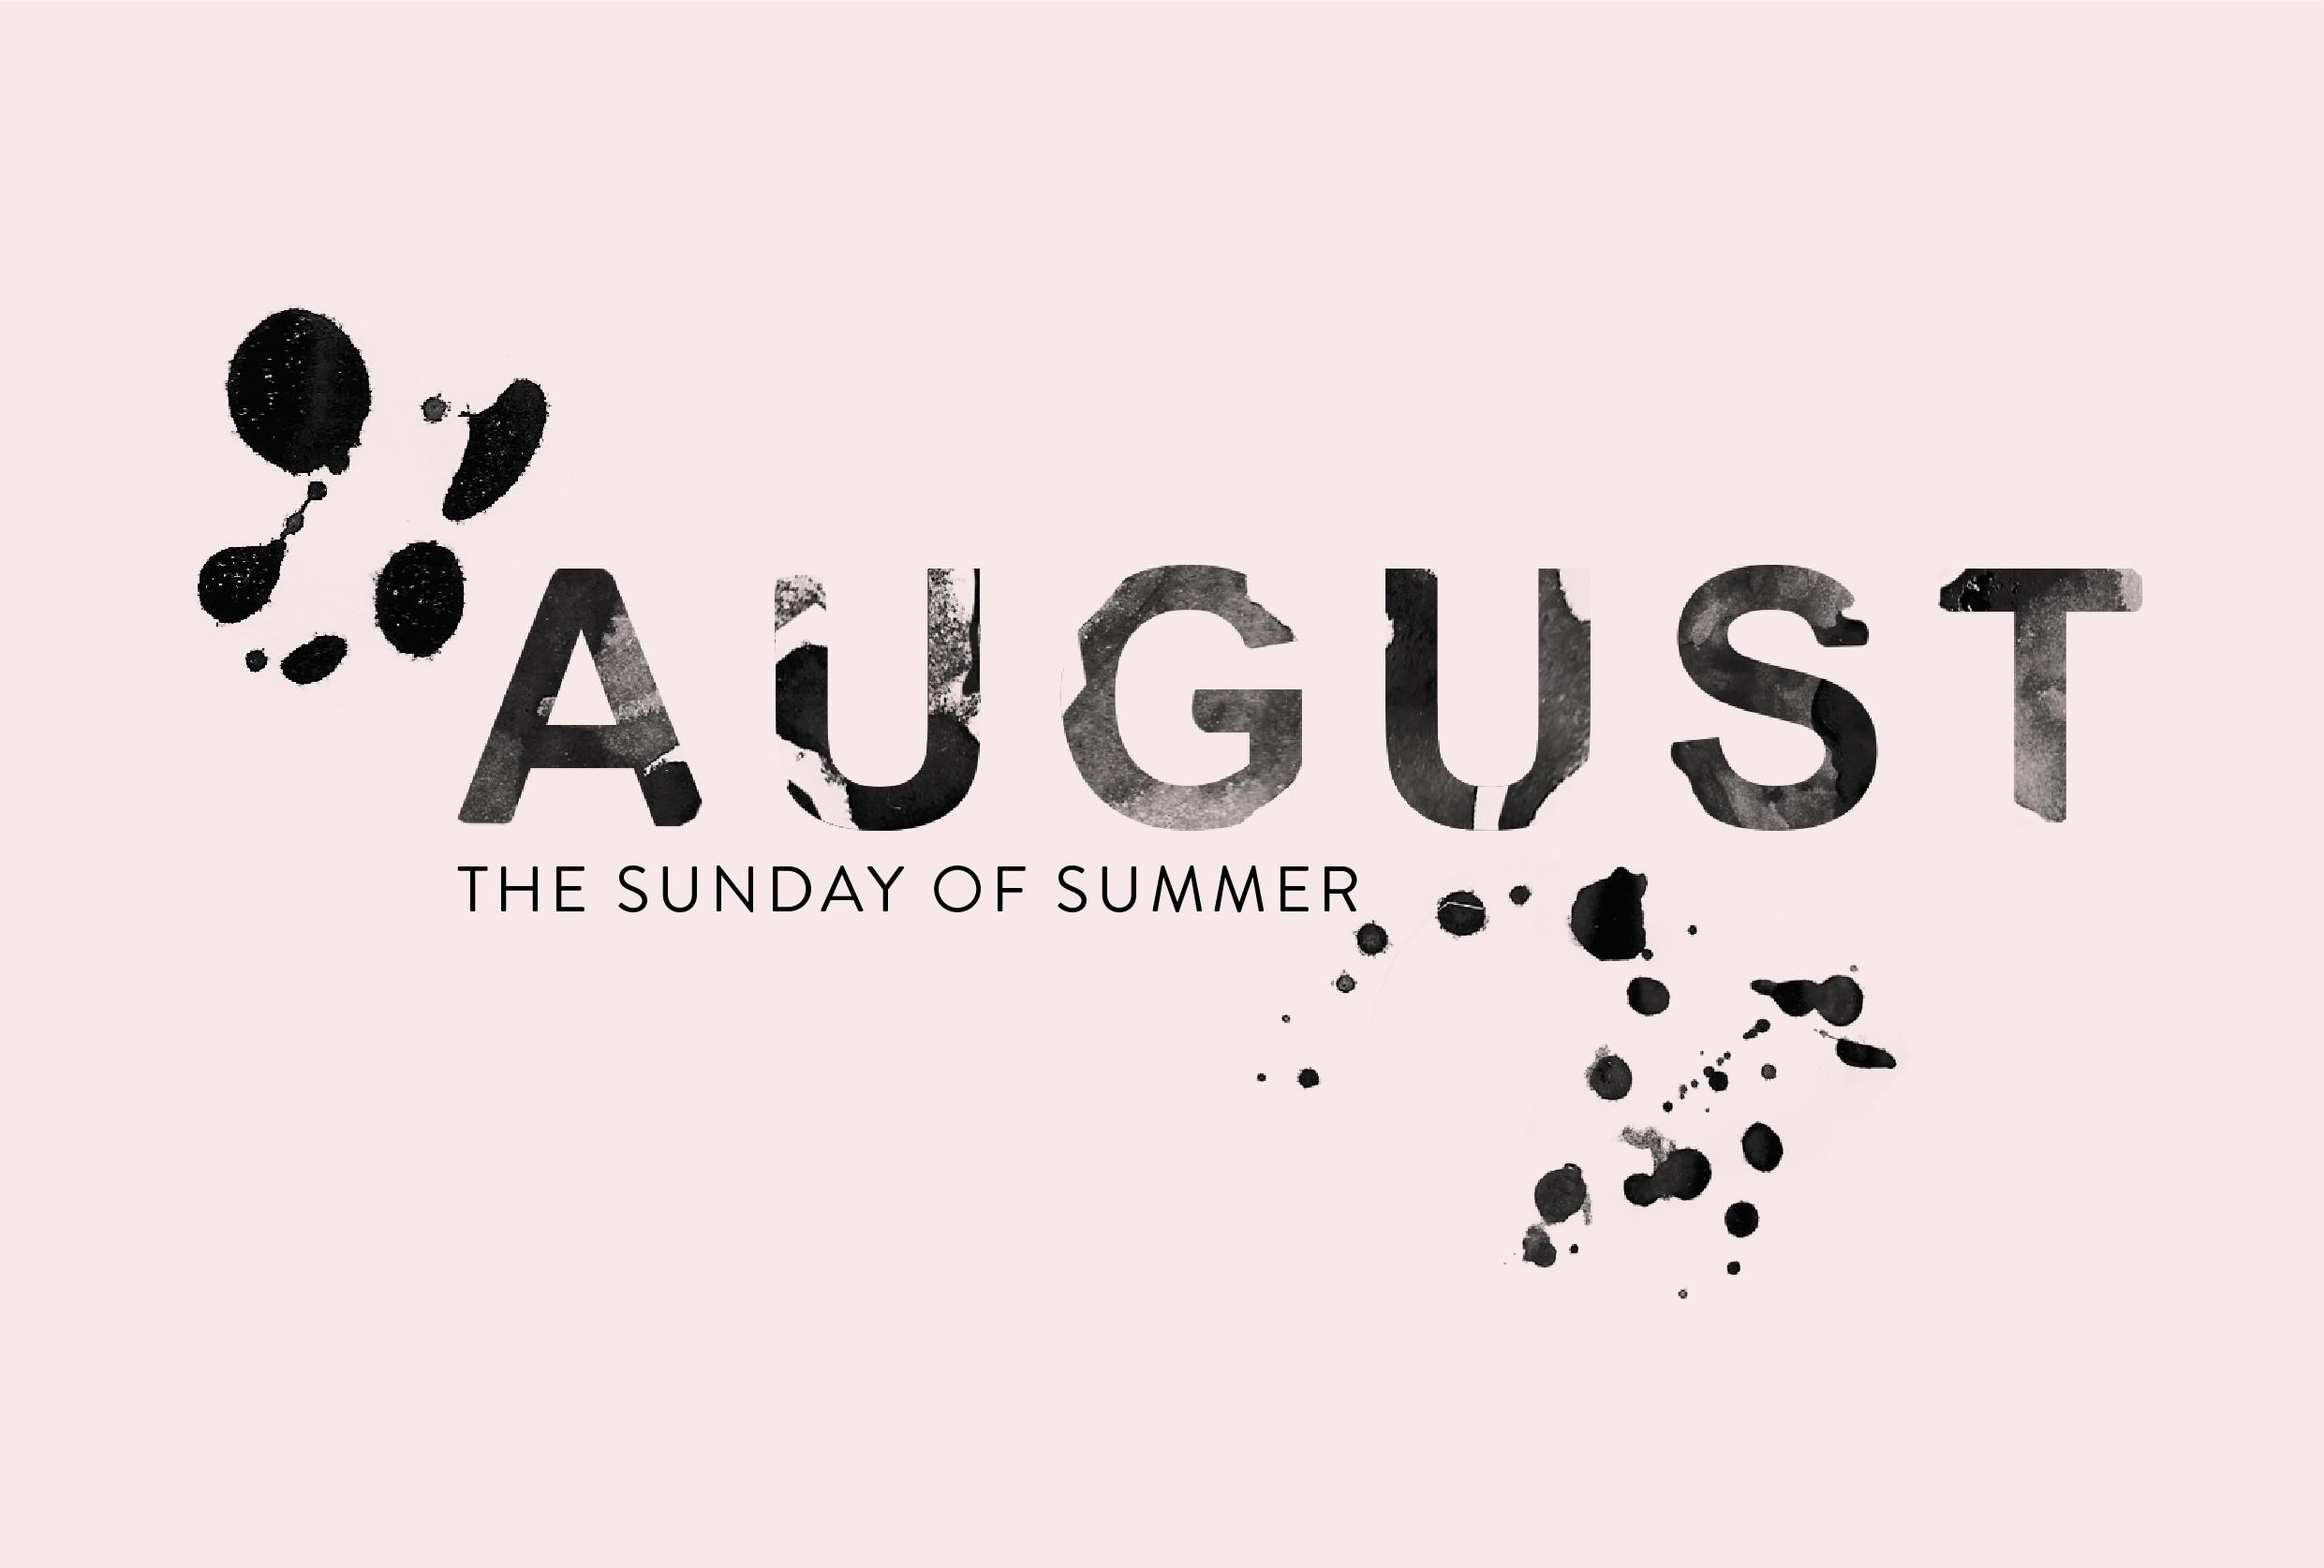 August The Sunday of Summer #typography #watercolor #design #graphicdesign #logodesign #branding #designblog #designer #august #summer